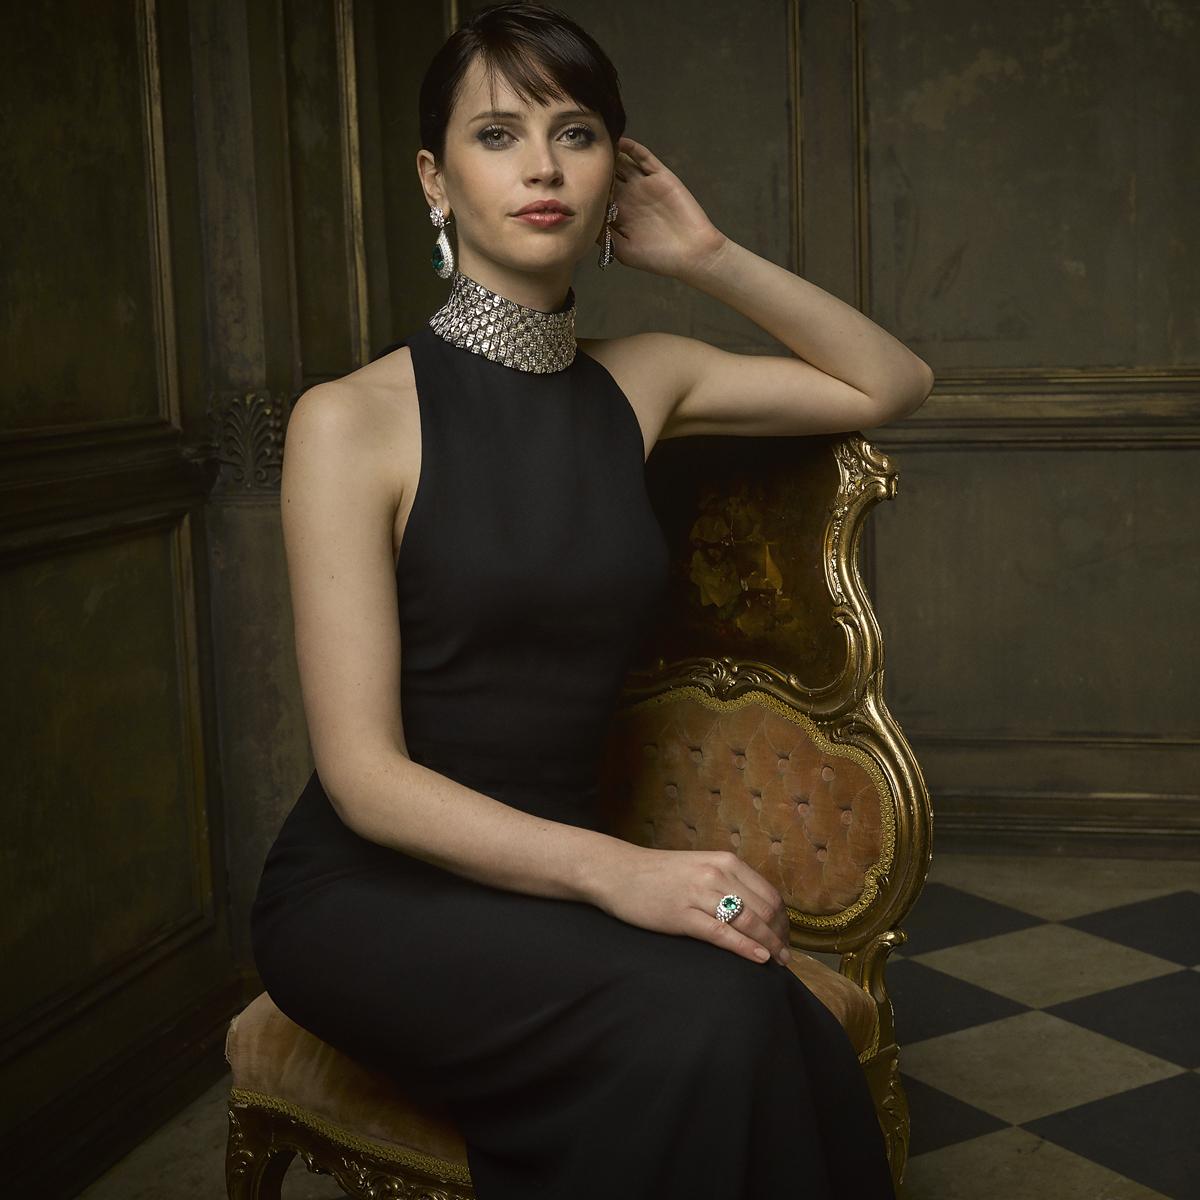 Фотопортреты звезд от Марка Селиджер (Mark Seliger) после церемонии Оскара: Фелисити Джонс